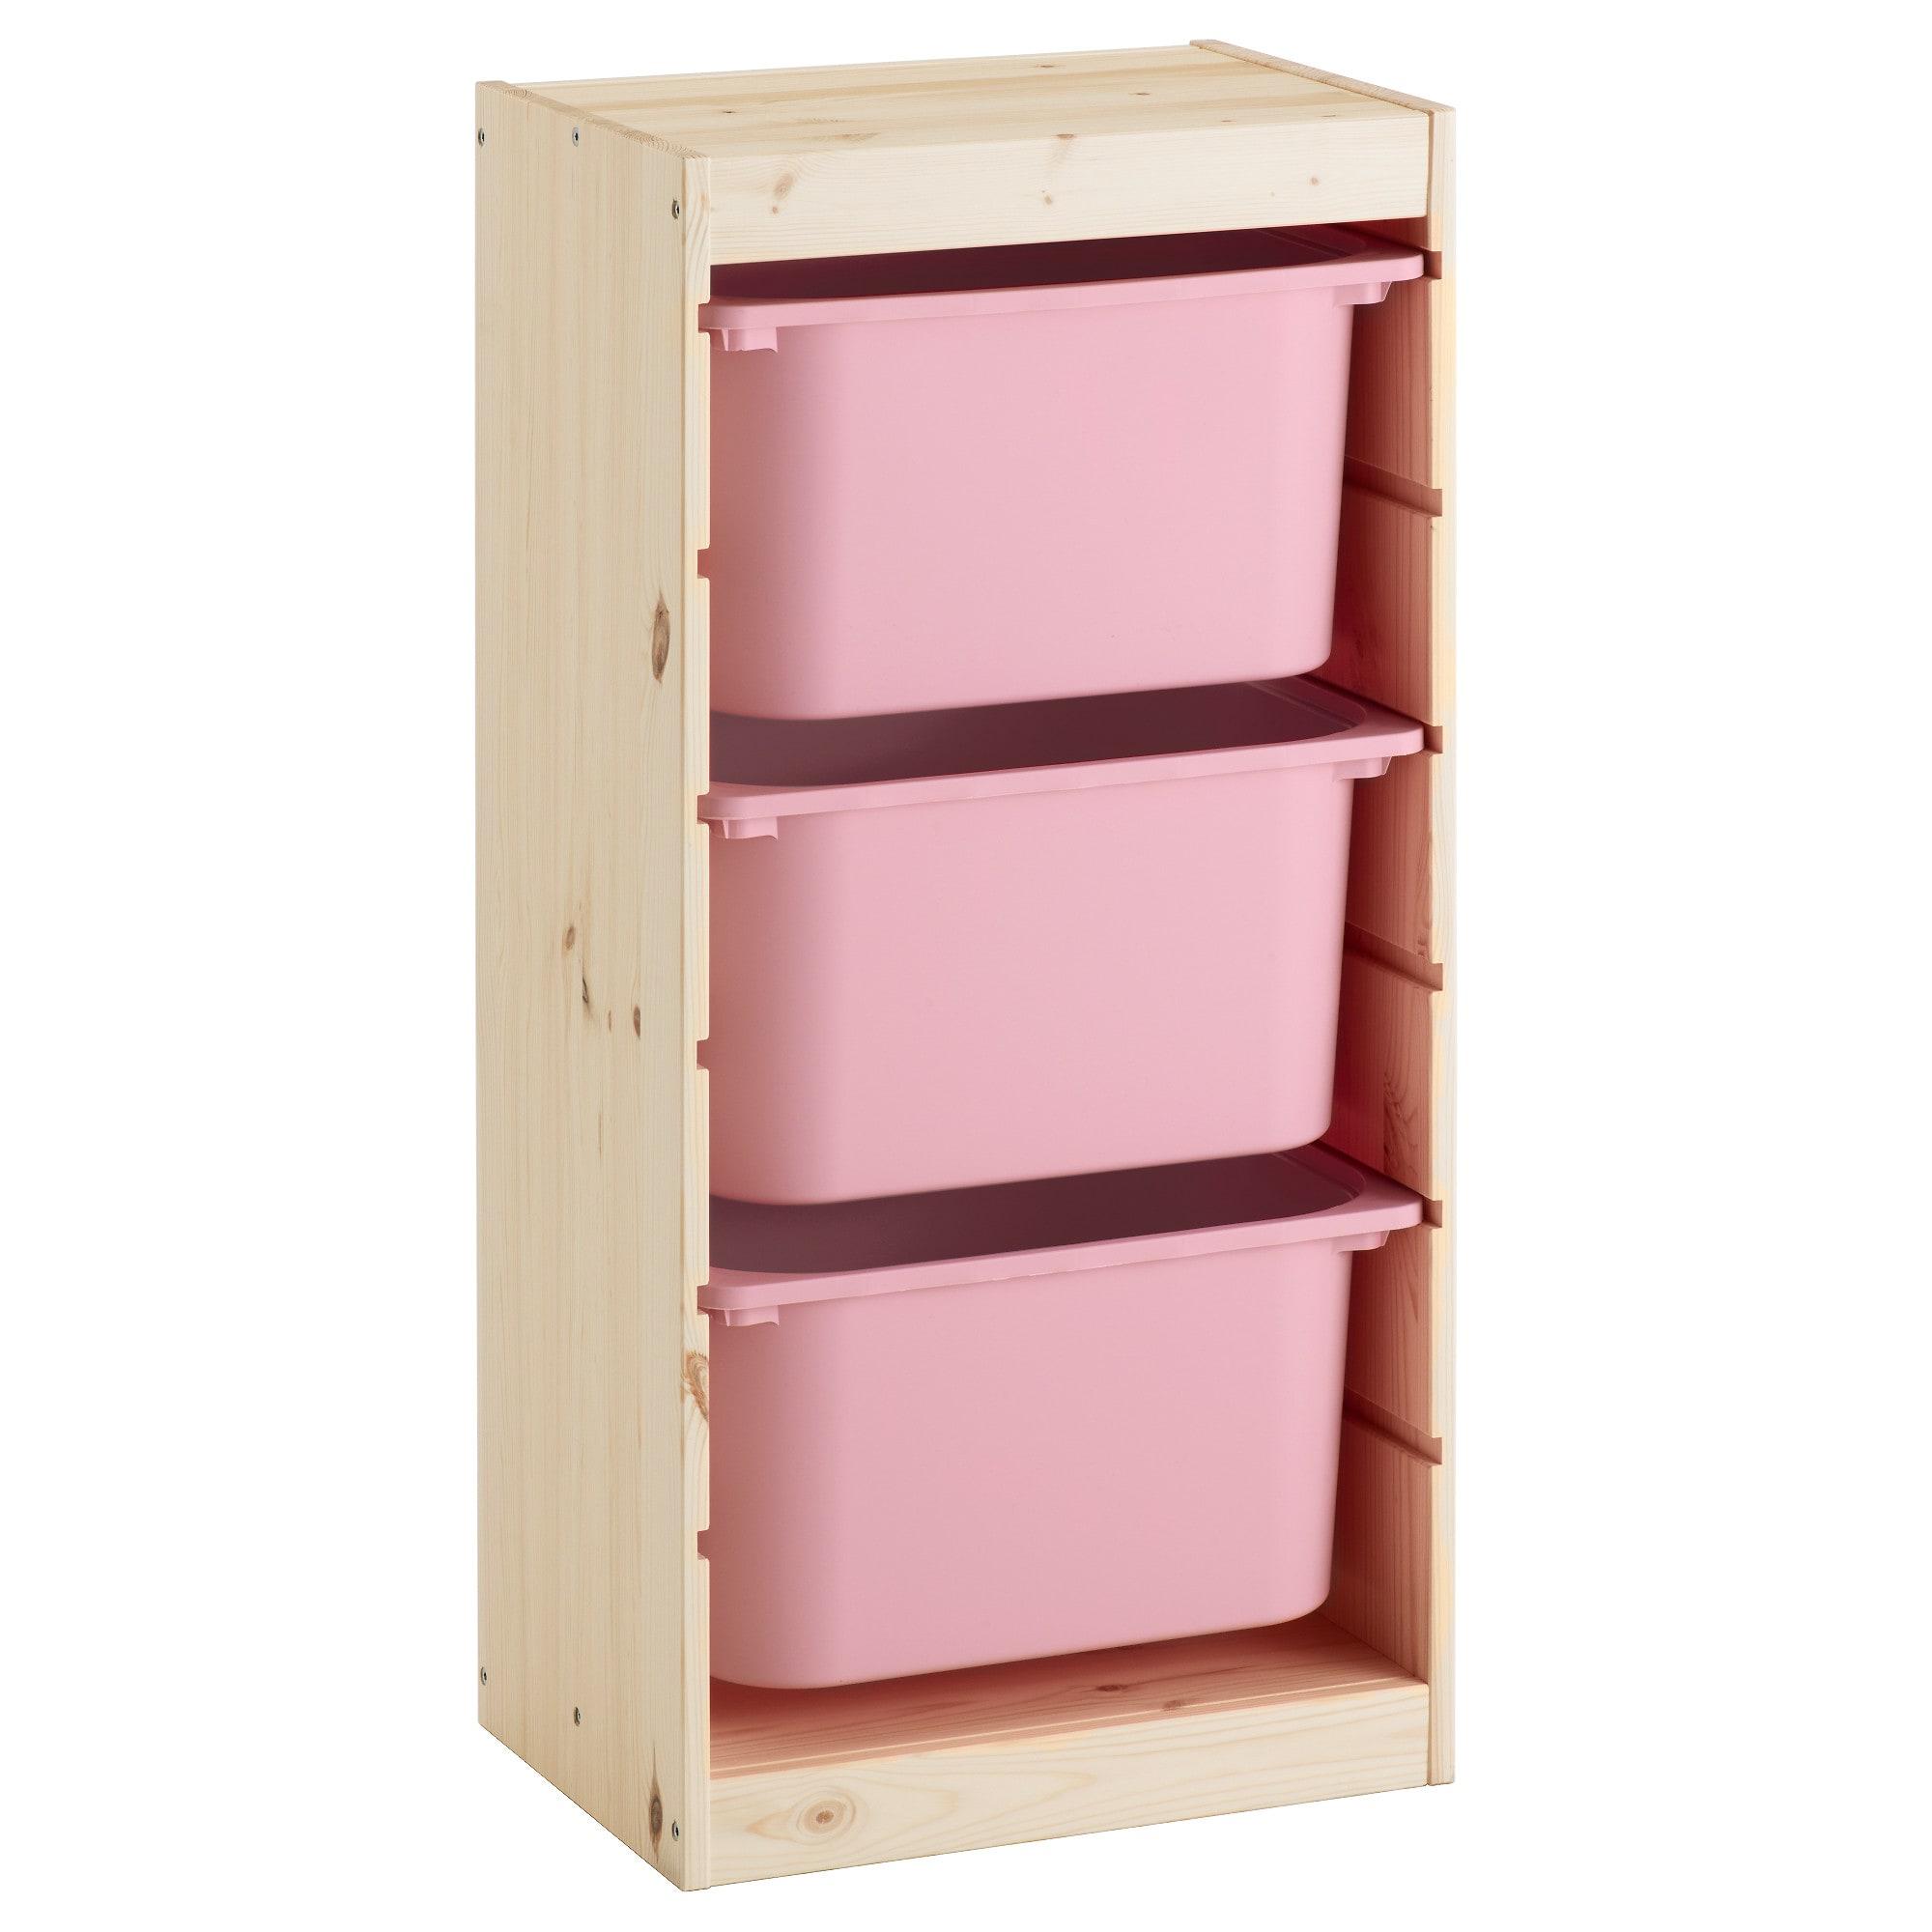 Mueble Almacenaje Juguetes Gdd0 Almacenaje De Juguetes Guardar Los Juguetes Pra Online Ikea